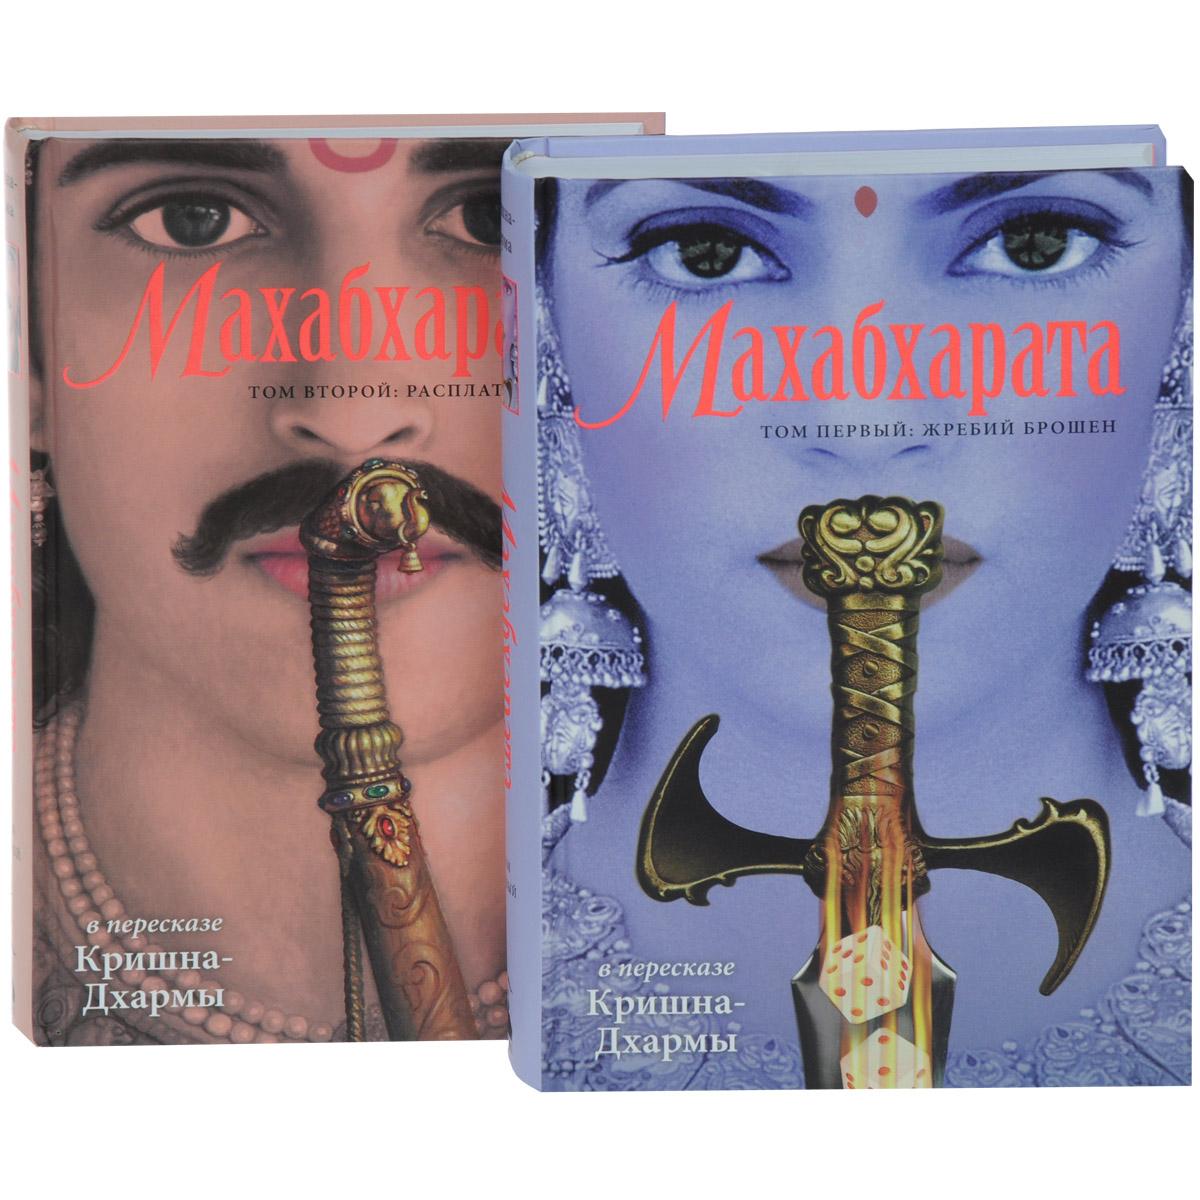 Кришна-Дхарма дас Махабхарата в 2 томах (комплект из 2 книг) тхакур б шри кришна самхита